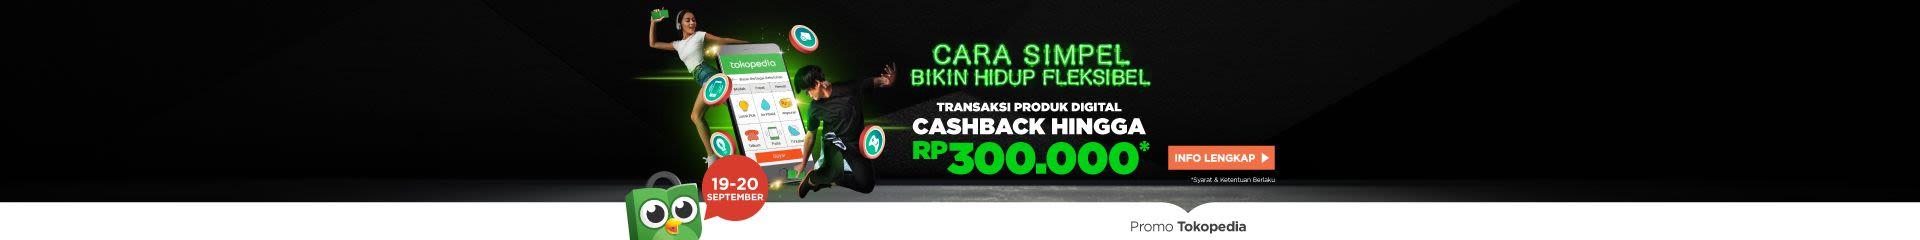 Bayar produk Digital sekarang dan dapatkan cashback hingga Rp300.000!